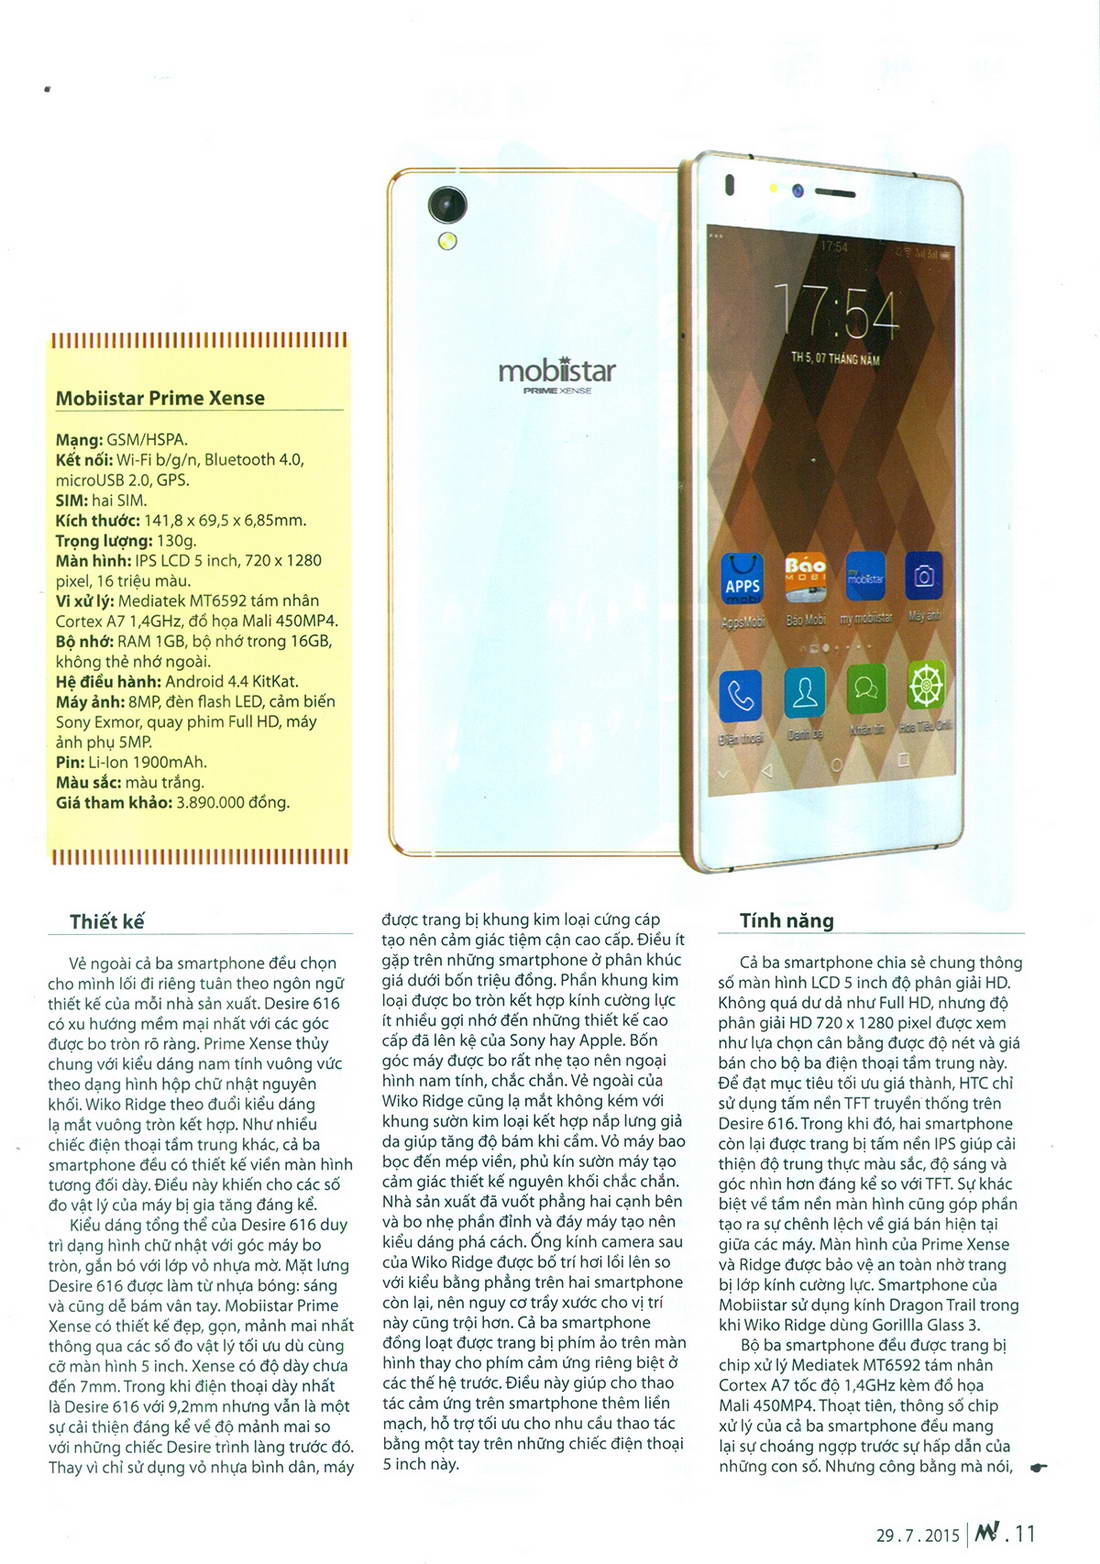 EChip Mobile – 510 - tapchicntt.com